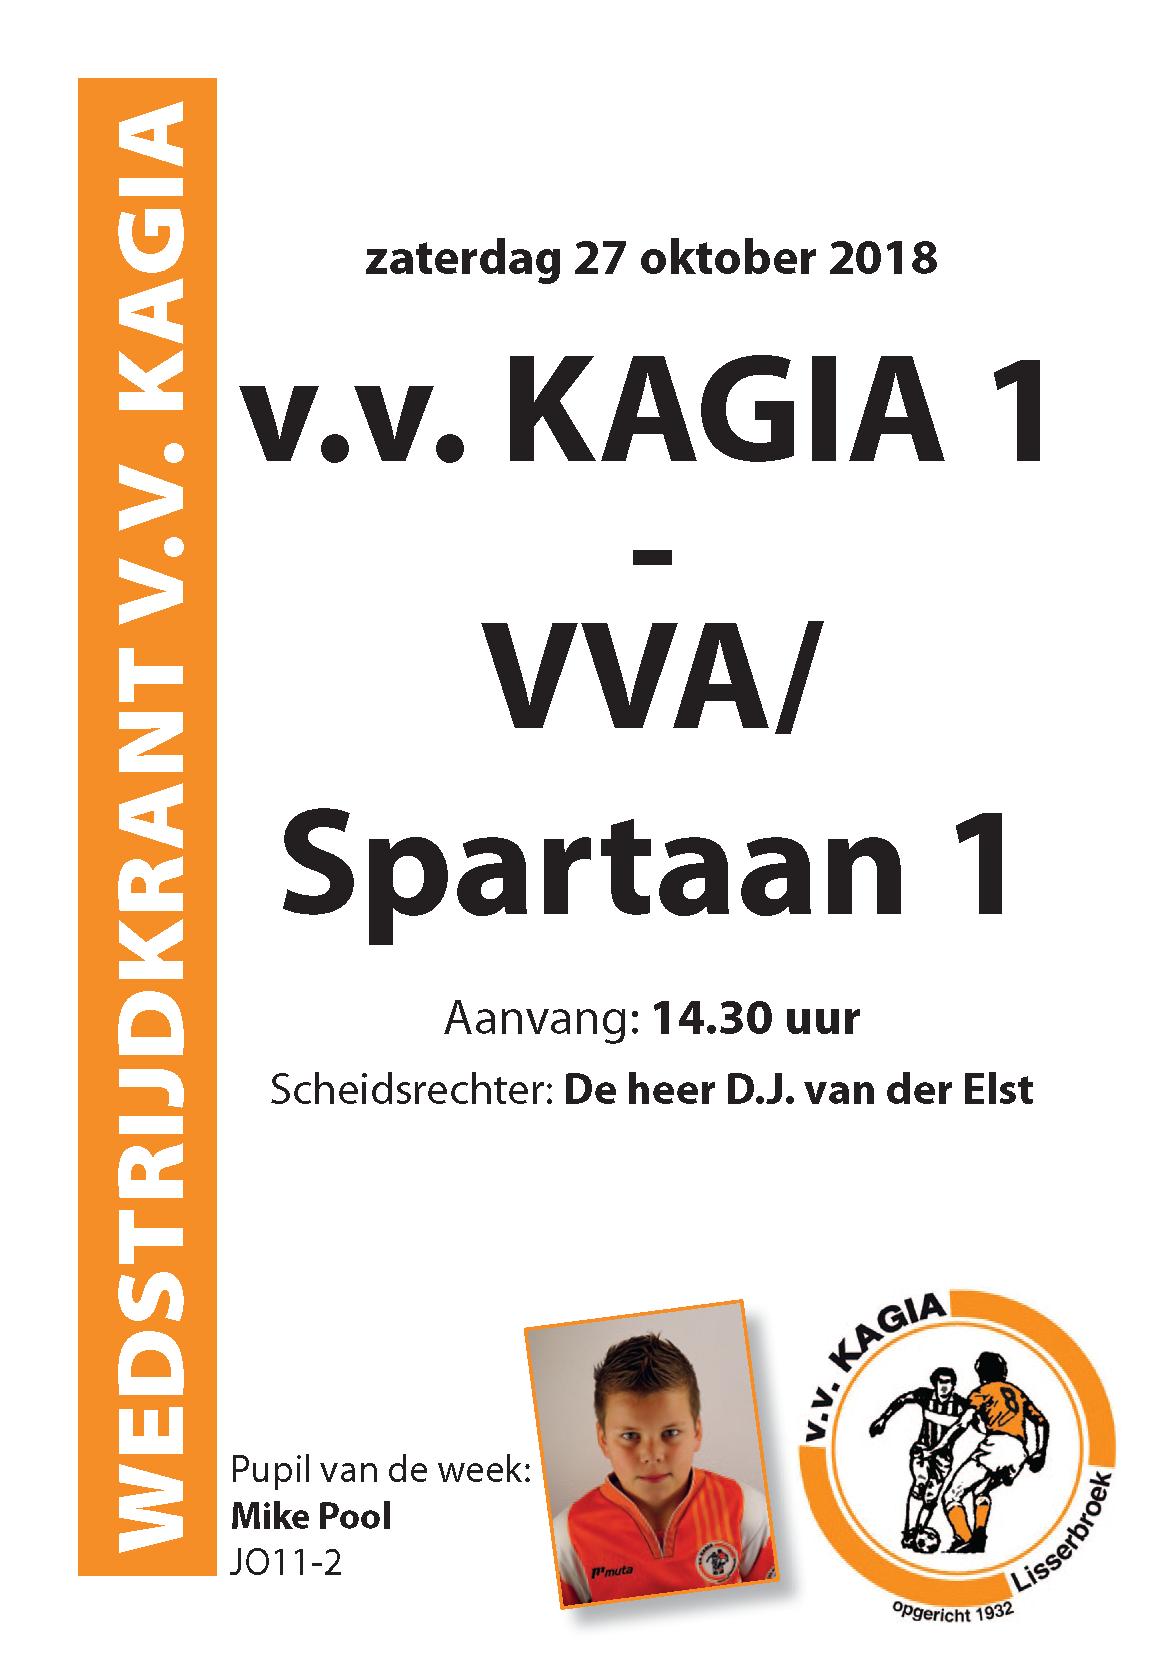 Wedstrijdkrantje | v.v. Kagia 1 – VVA/Spartaan 1